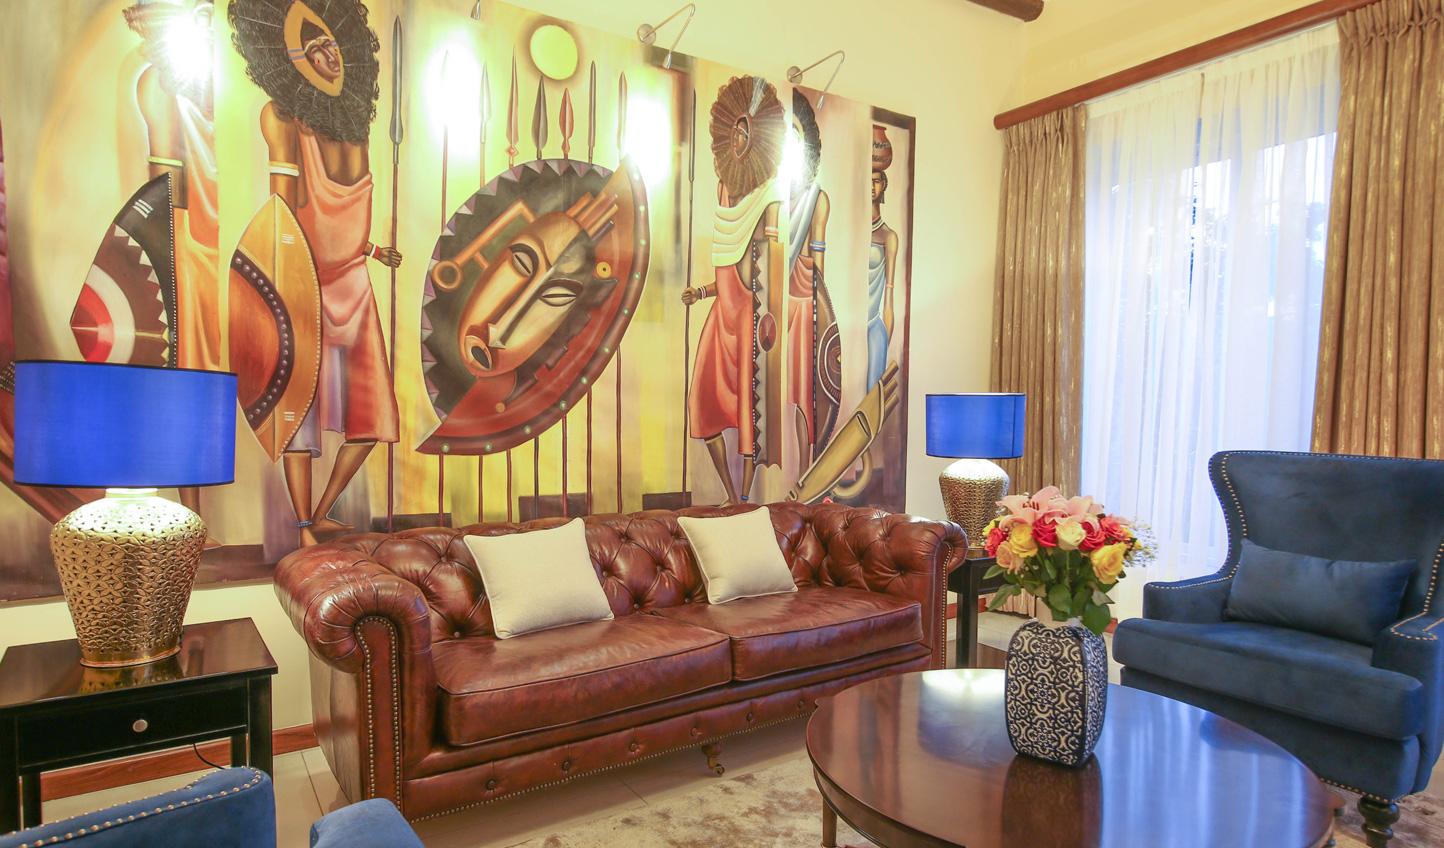 Warm Ugandan hospitality in a calming setting